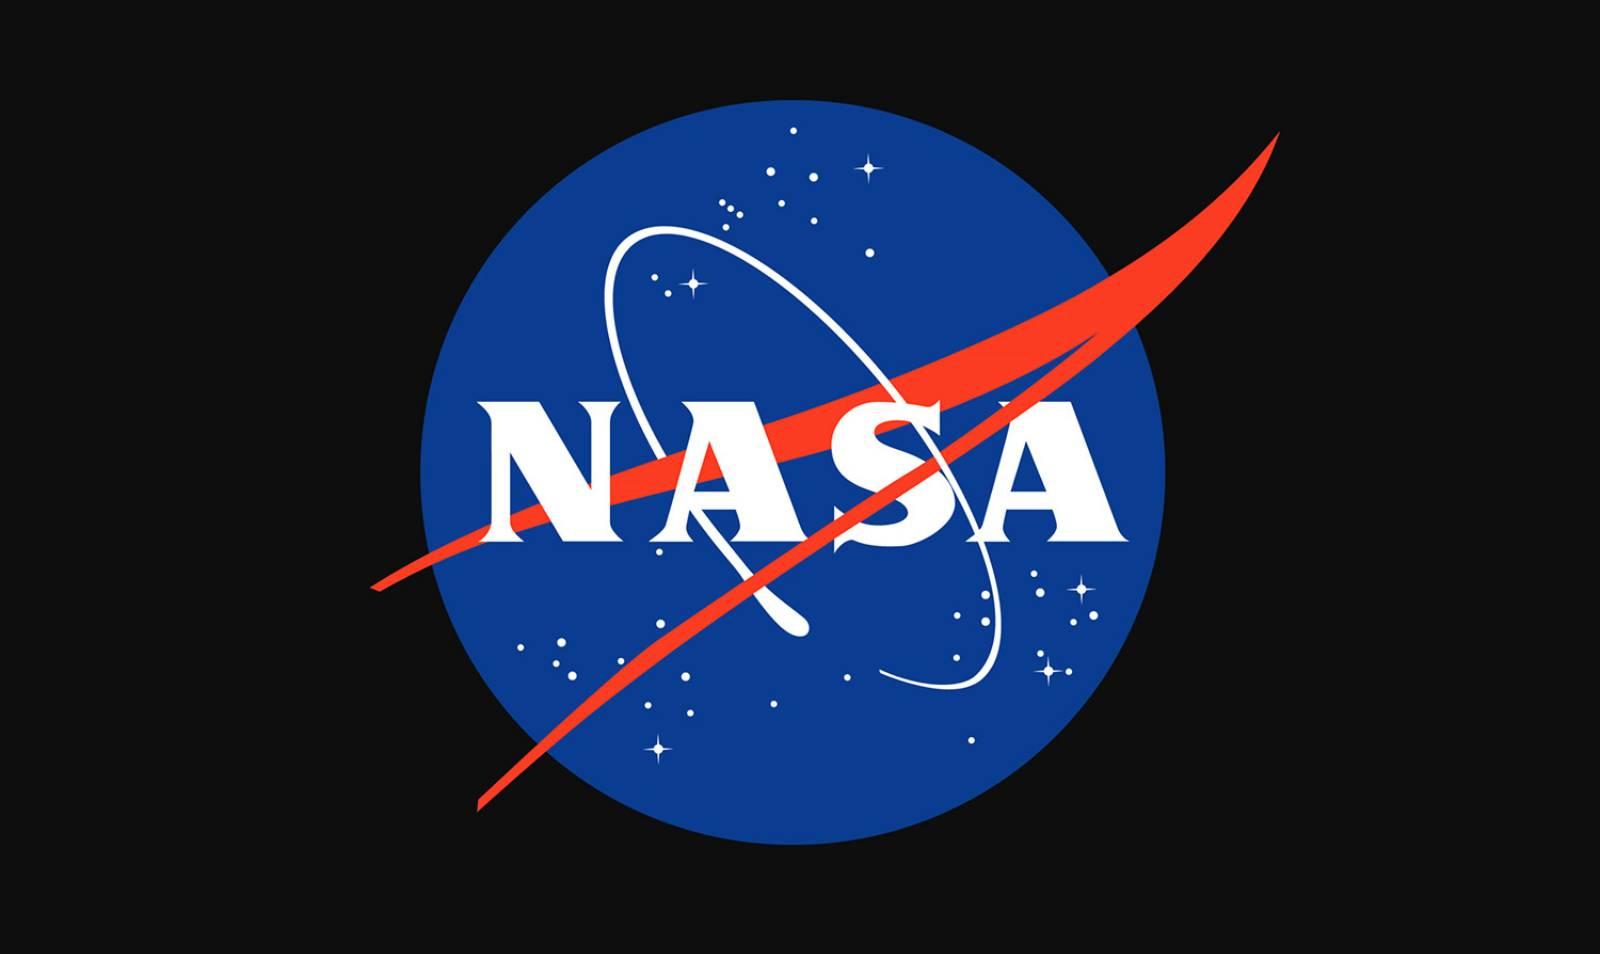 NASA Primul Hotel Robotii Spatiul Cosmic